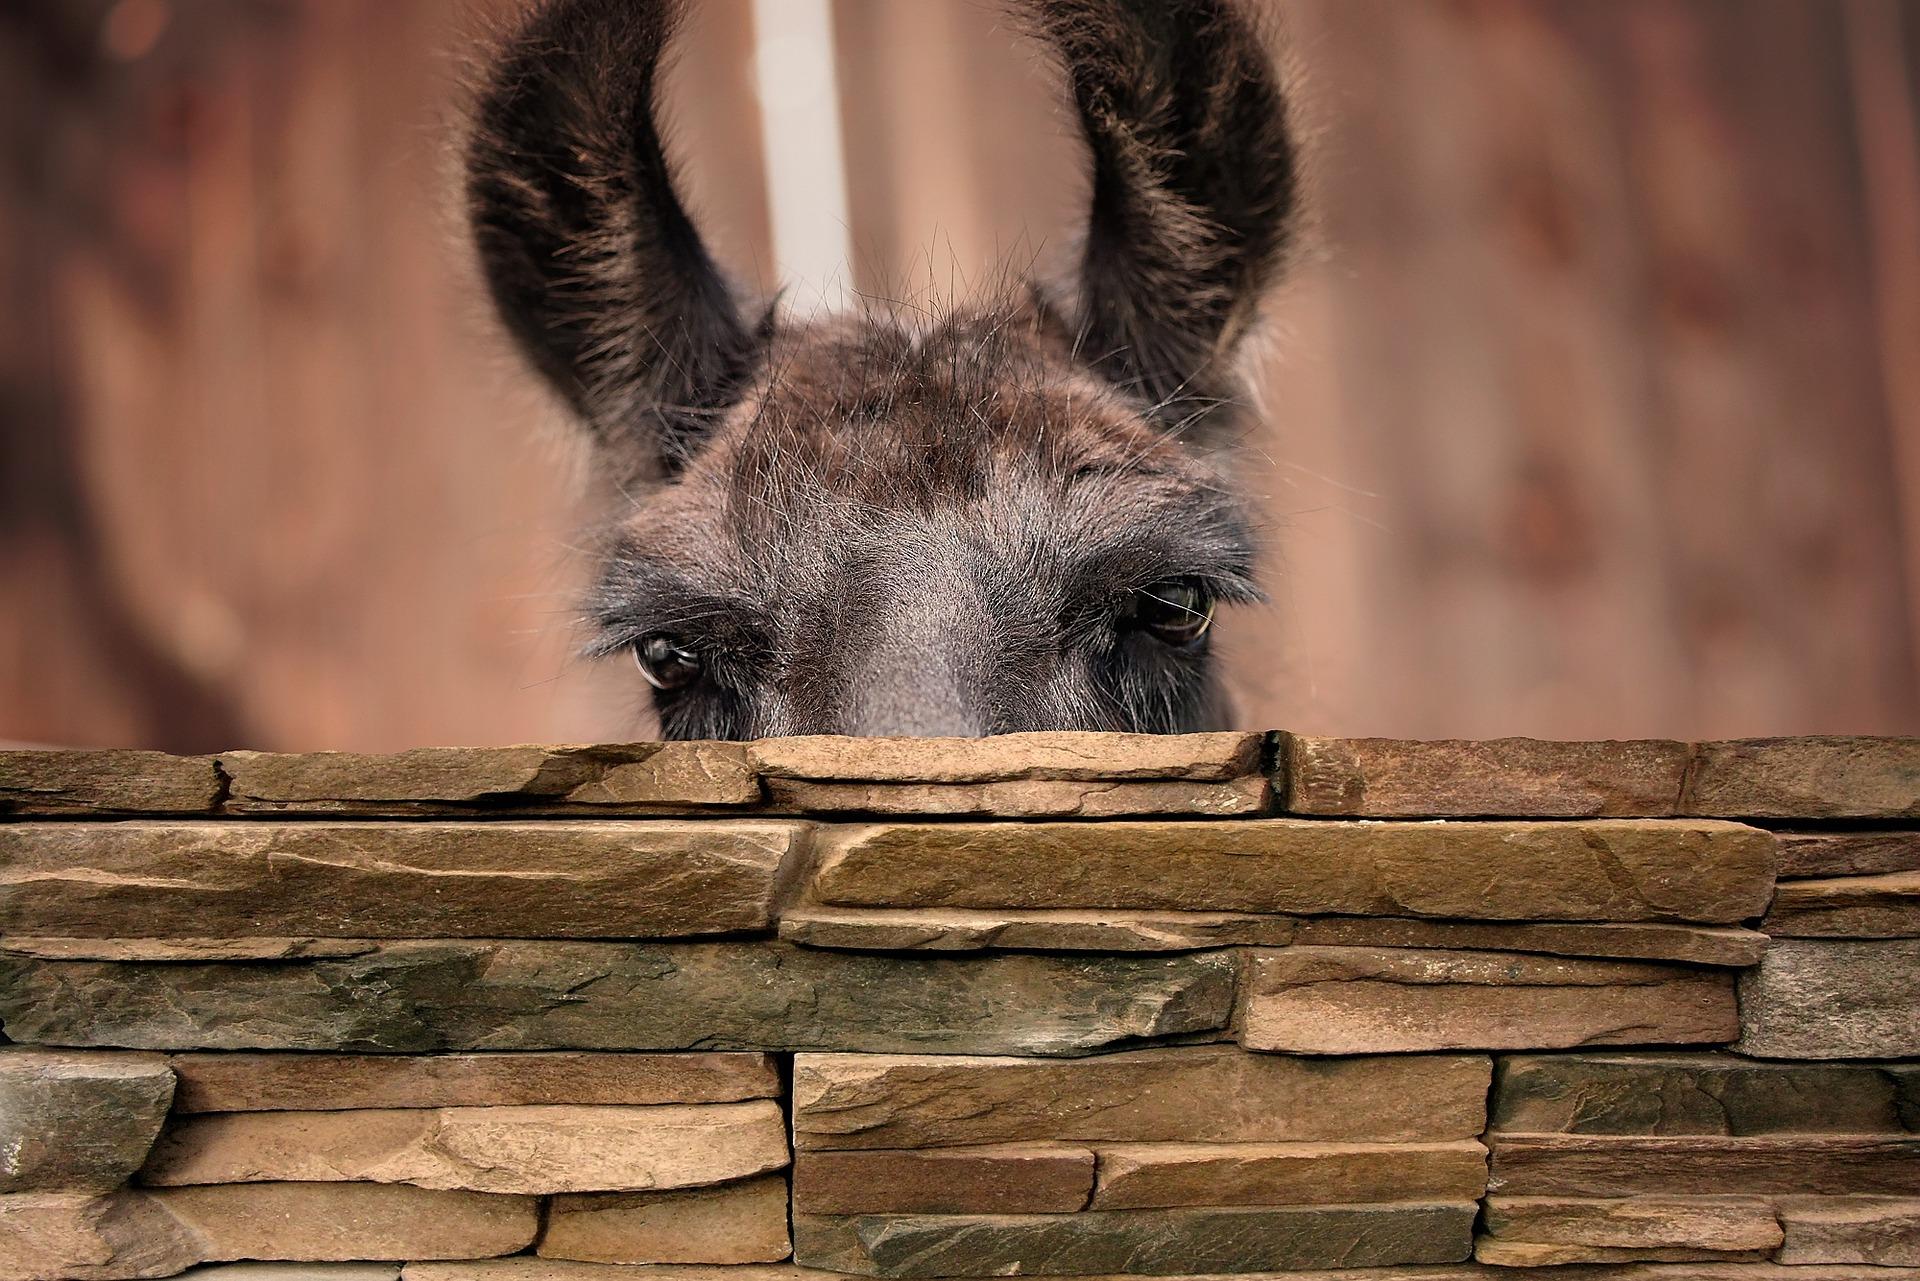 Llama peeps over wall (Image by Pezibear from Pixabay)